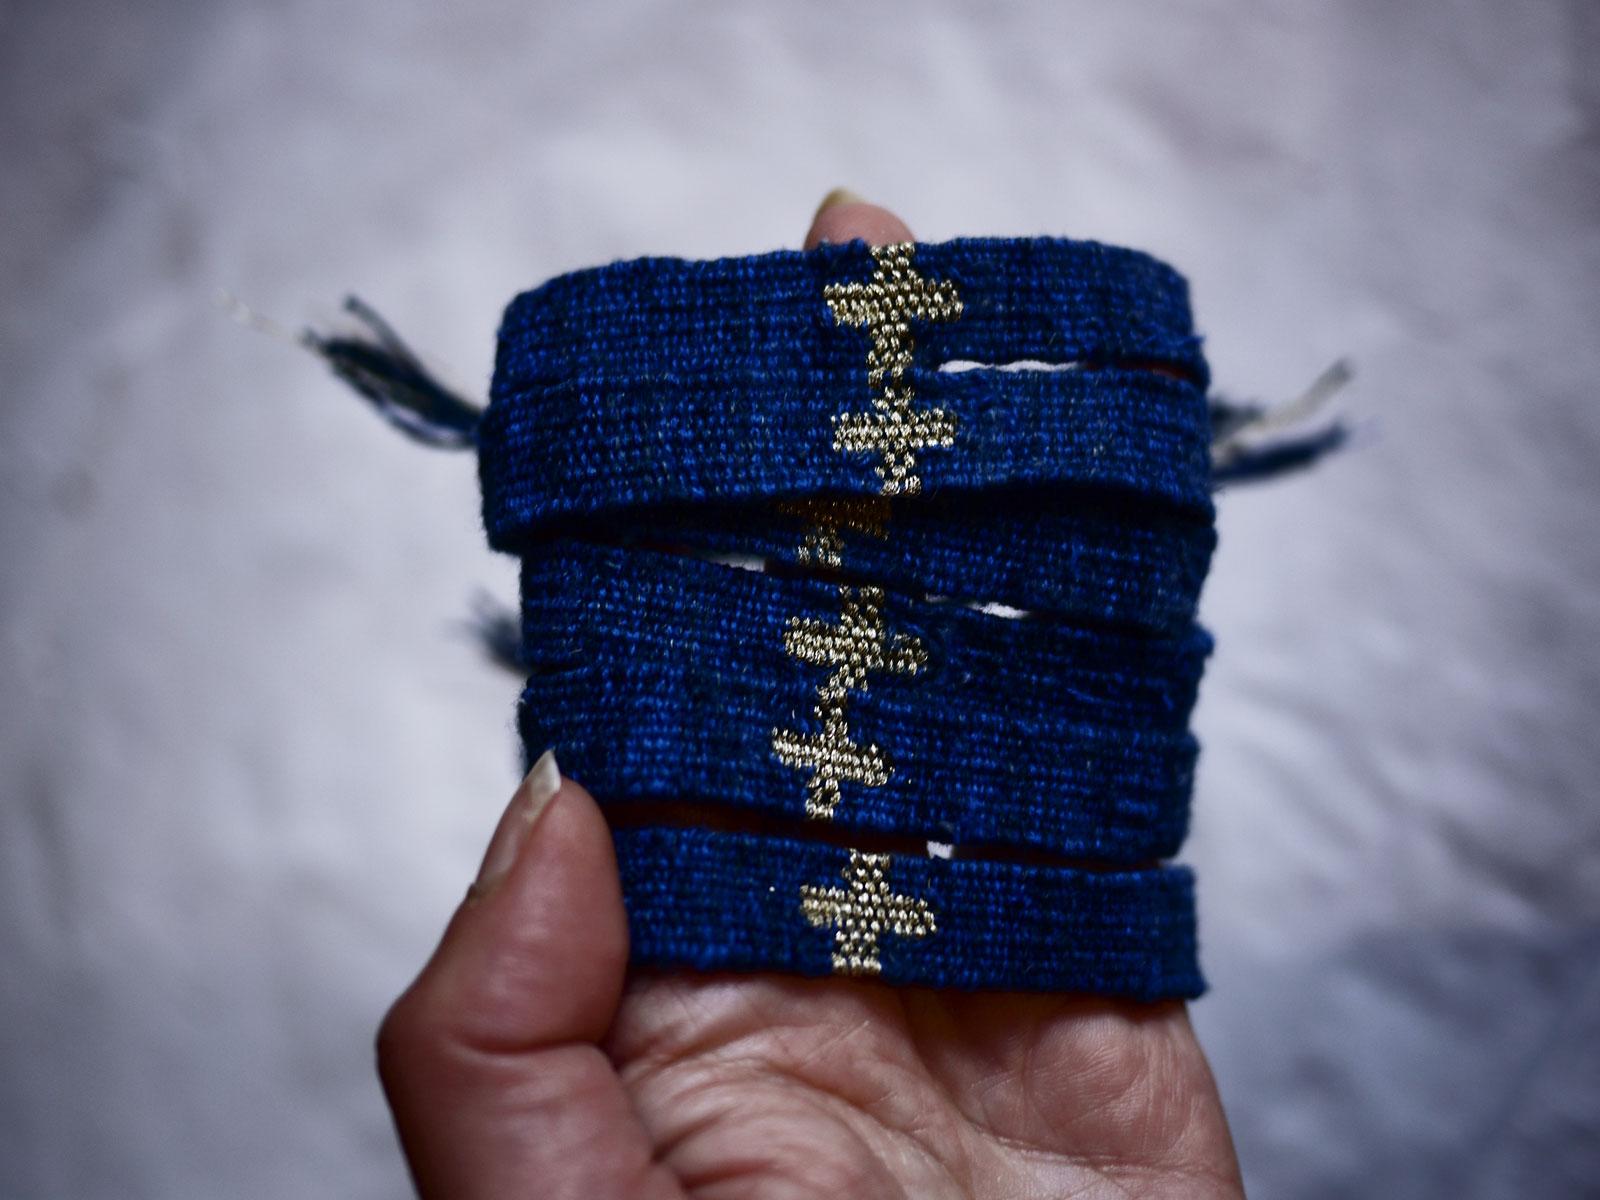 Bracelets LOOM - Design textile by Myriam Balaÿ myriam-balay-indigo BLUE LOOM inspiration L'appartement